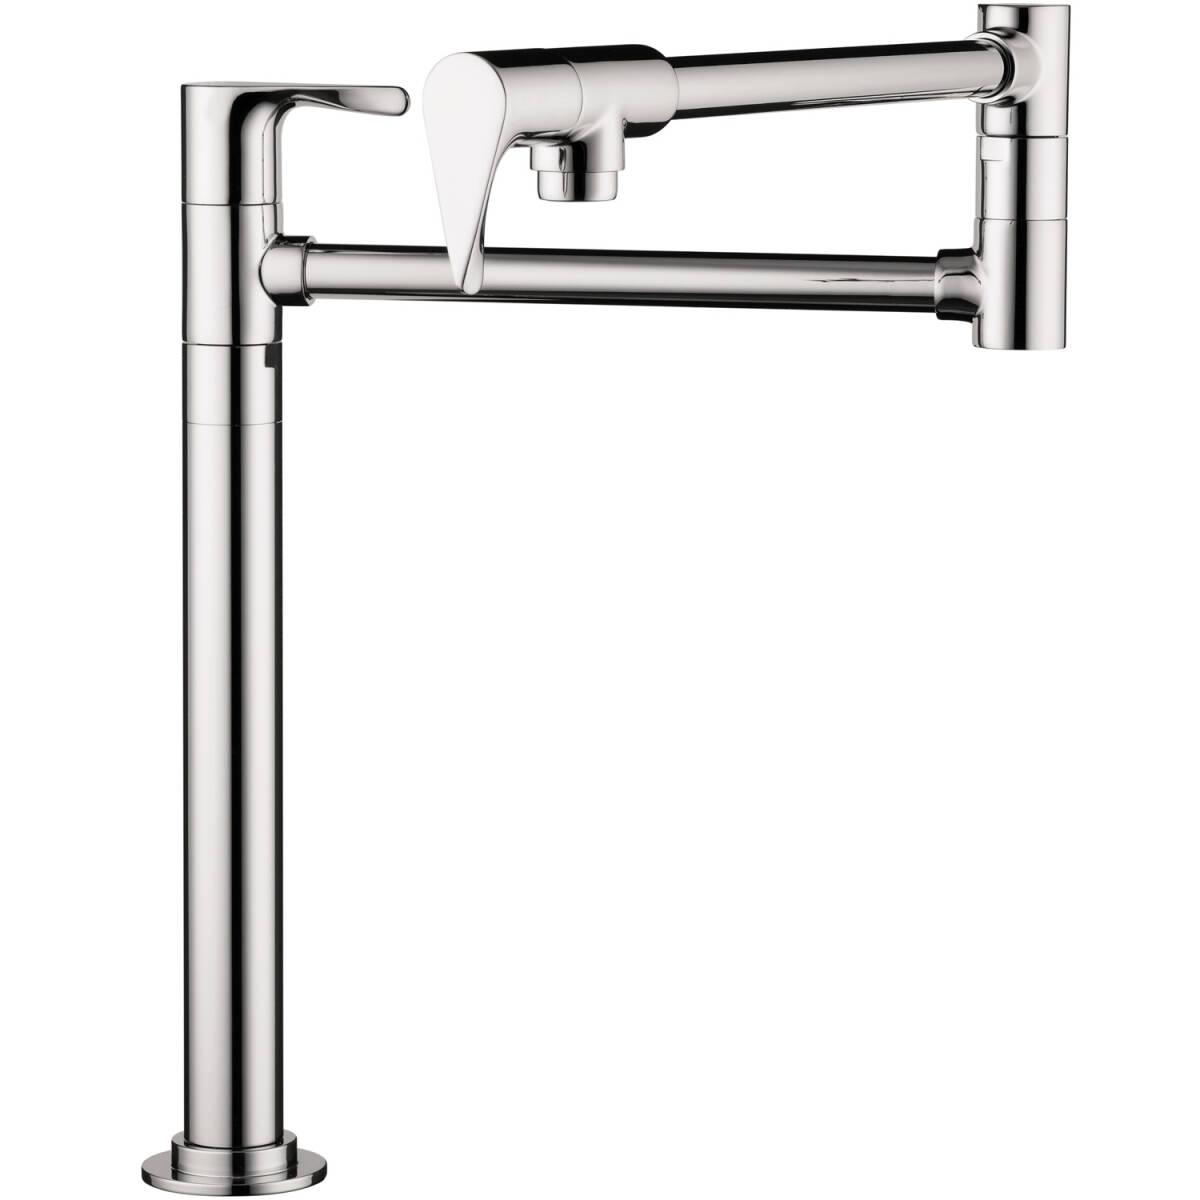 Single lever kitchen mixer deck-mounted, Chrome, 39838001